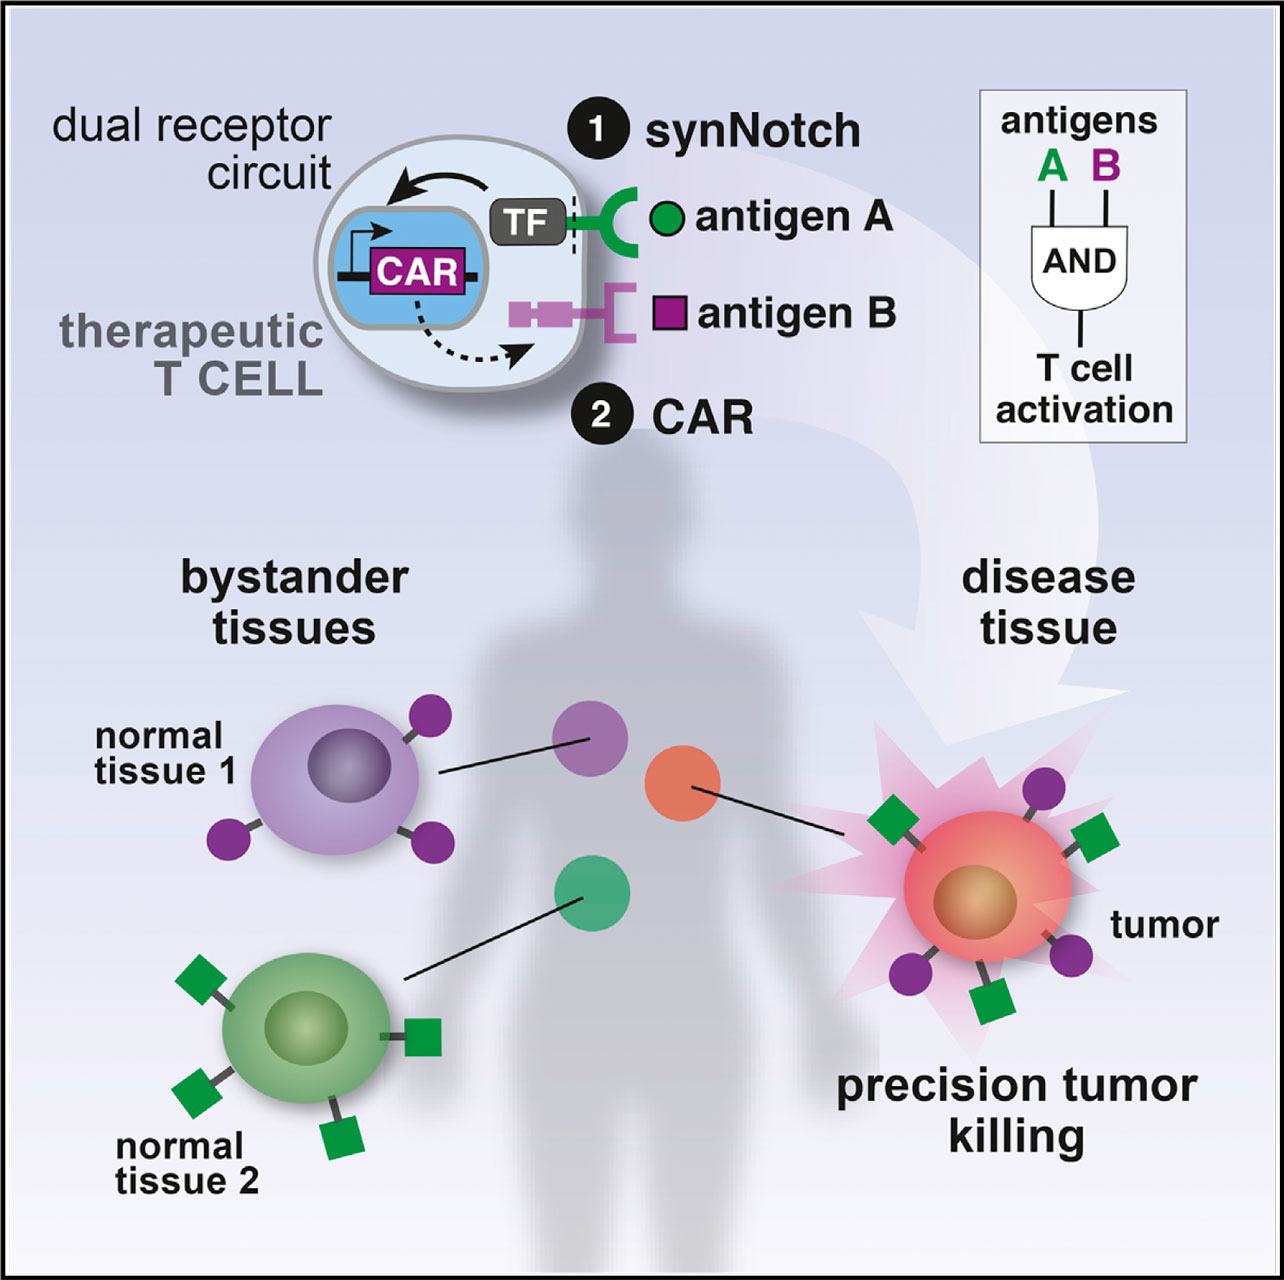 synNotch 03 - Cell Design Labs и технологии программирования T-клеток